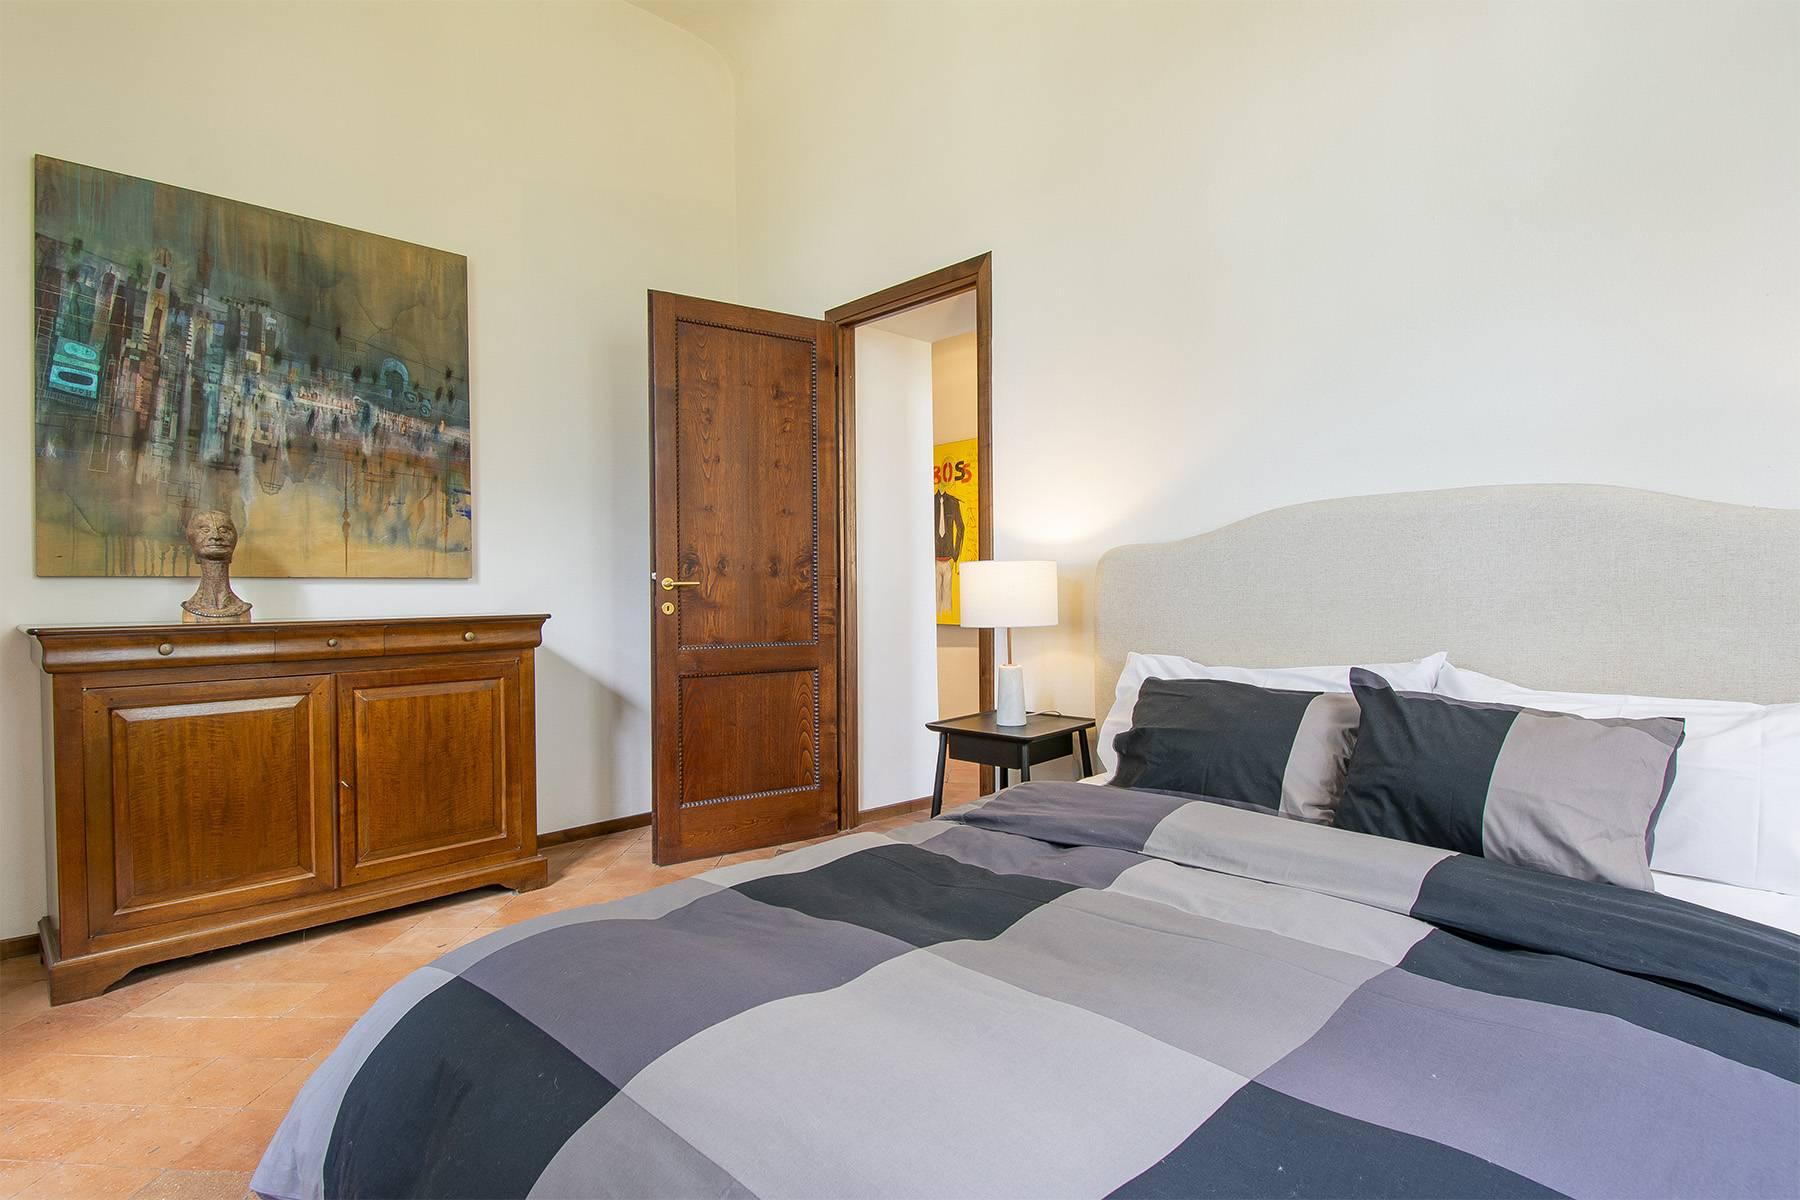 Villa in Vendita a Capannori: 5 locali, 380 mq - Foto 21